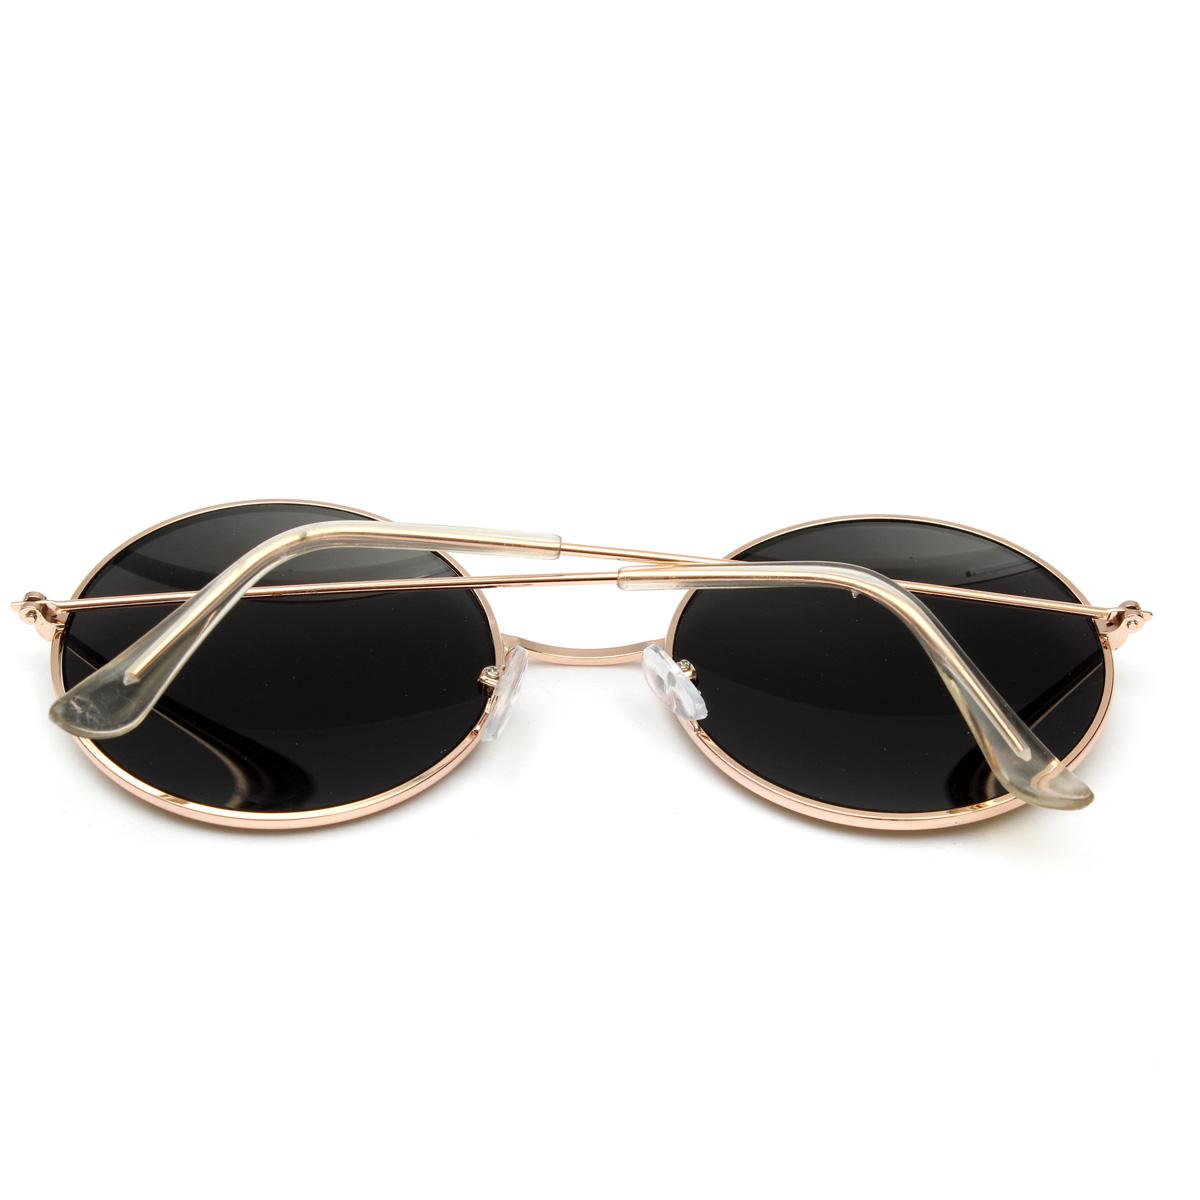 Round Frame Glasses Malaysia : Retro Vintage Men Women Big Round Metal Frame Sunglasses ...